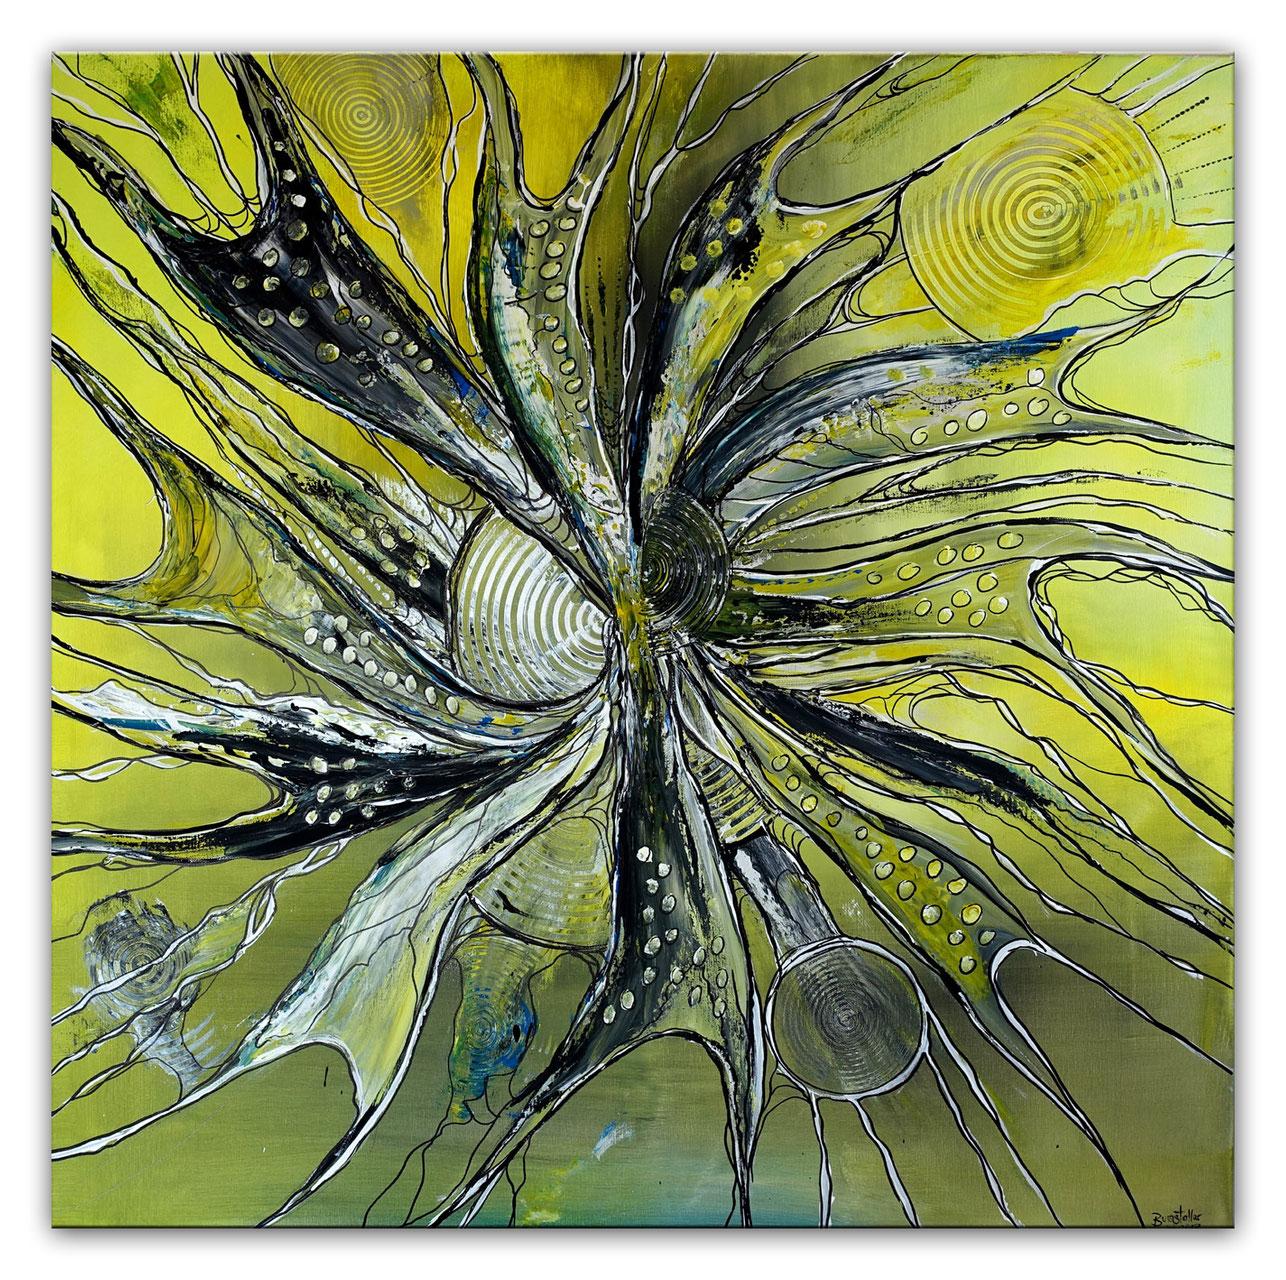 Expansion Abstrakte Malerei Gelb Grau Moderne Kunst Burgstaller